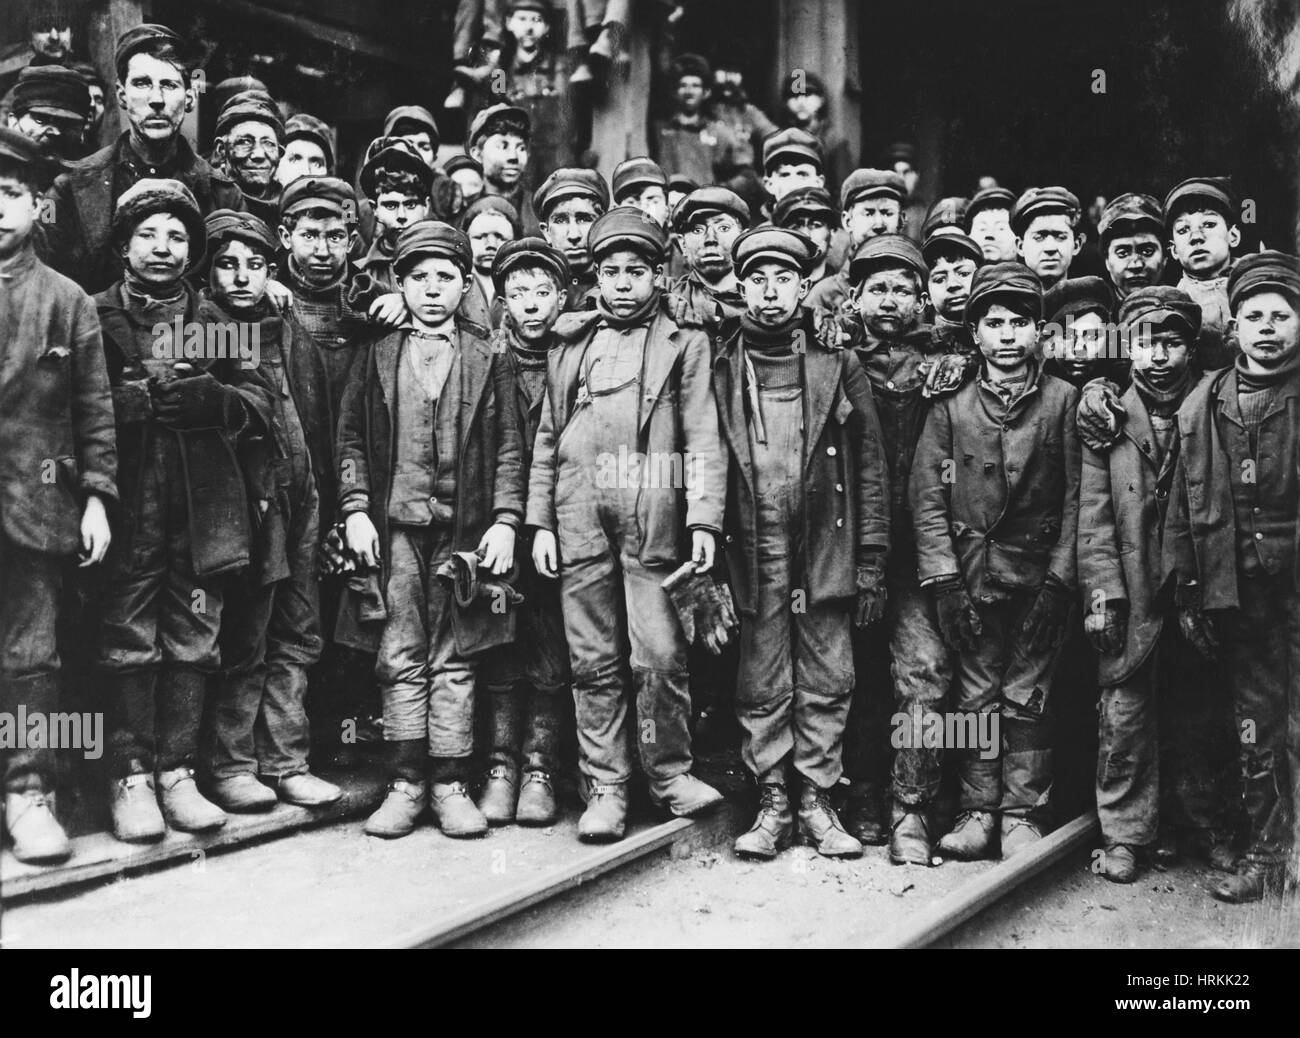 Breaker Boys, Lewis Hine, 1910 Immagini Stock